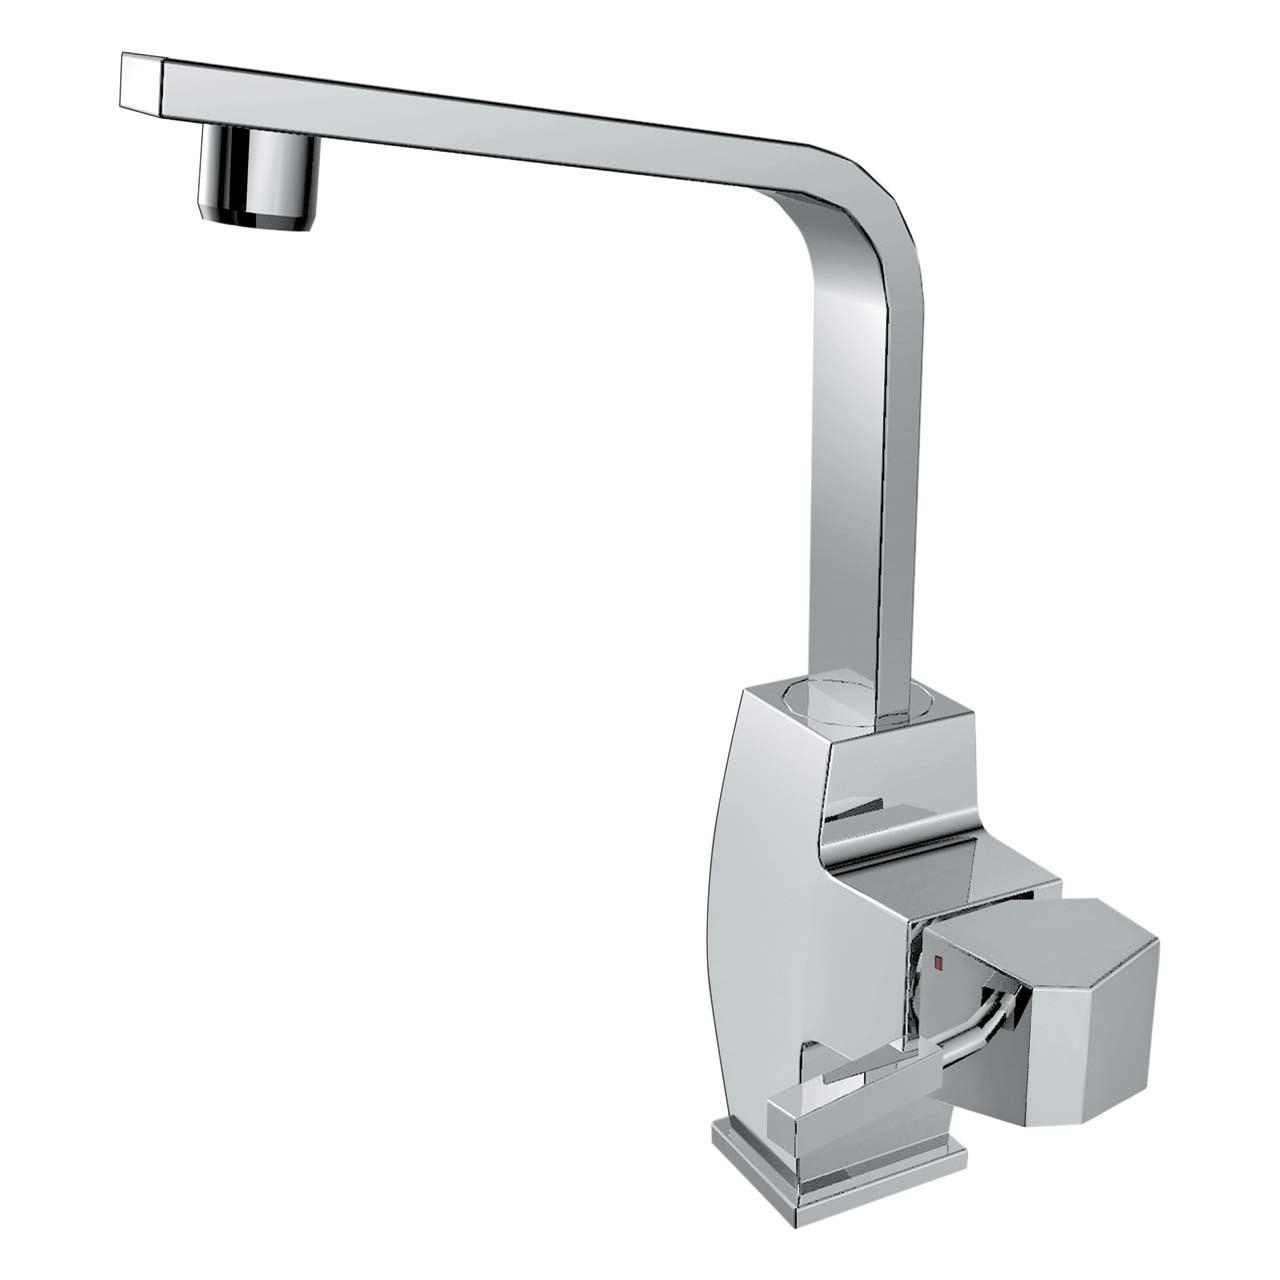 "<span style=""font-family:tahoma;"">شیر آشپزخانه الپس مدل ALIS نقره ای مات ALPS ALIS AP90465-NS Kitchen Faucets</span>"